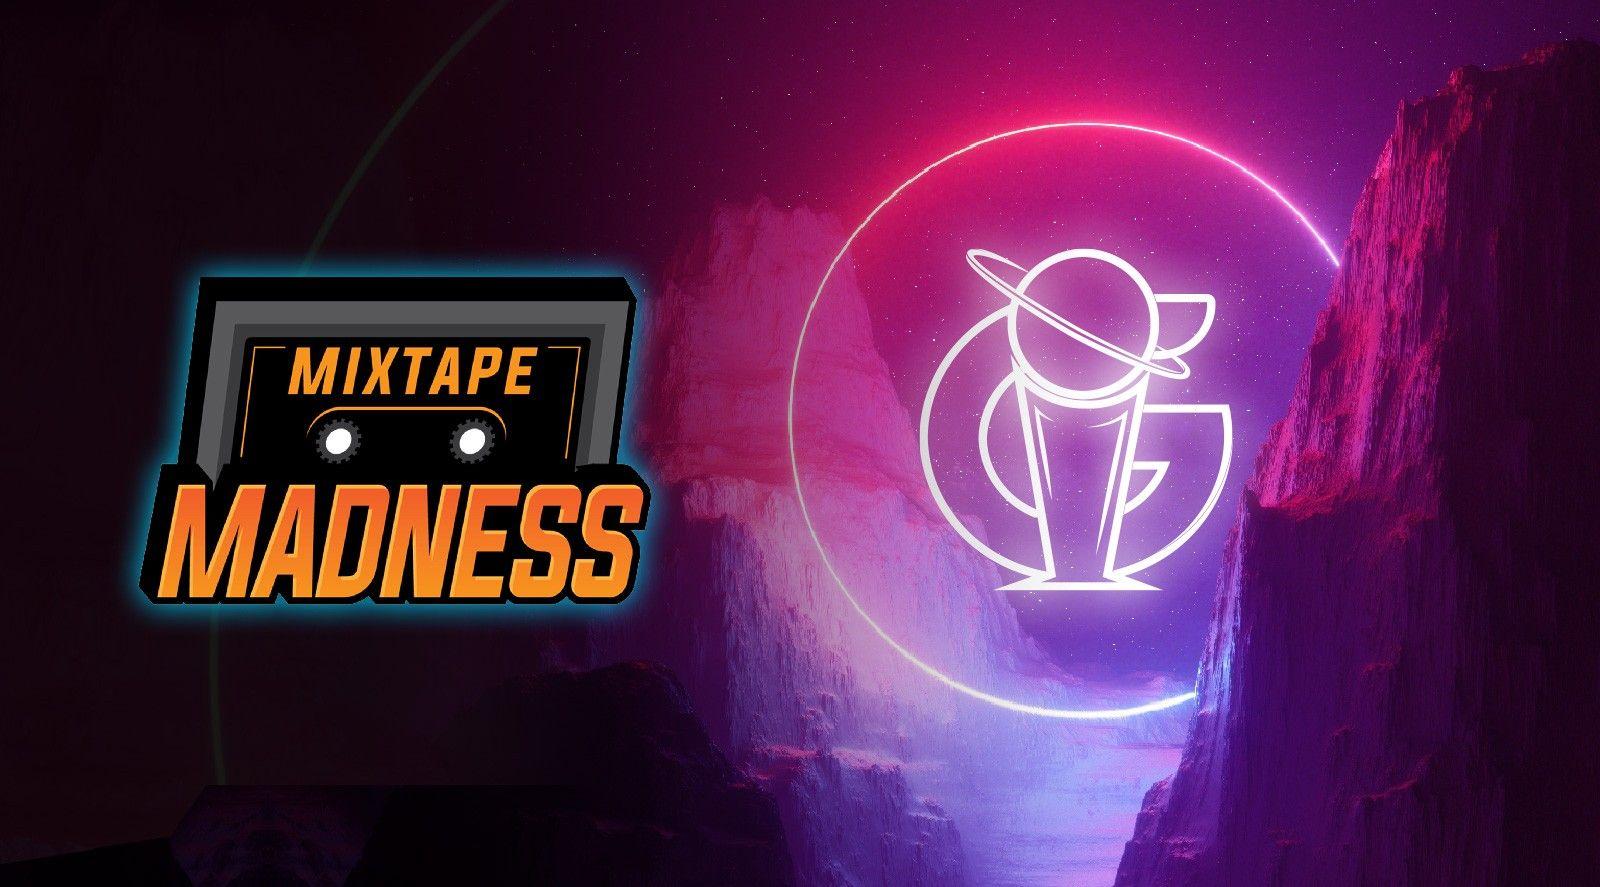 IG x Mixtape Madness Partnership Announcement